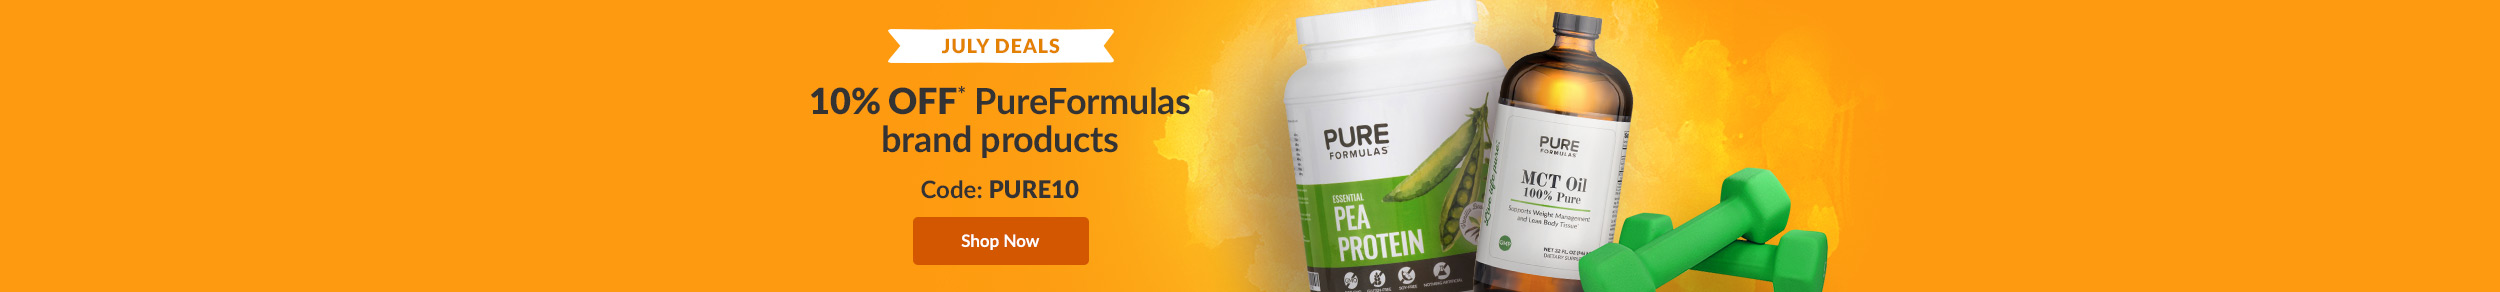 https://i3.pureformulas.net/images/static/PureFormulas_Fitness_Store_062819.jpg